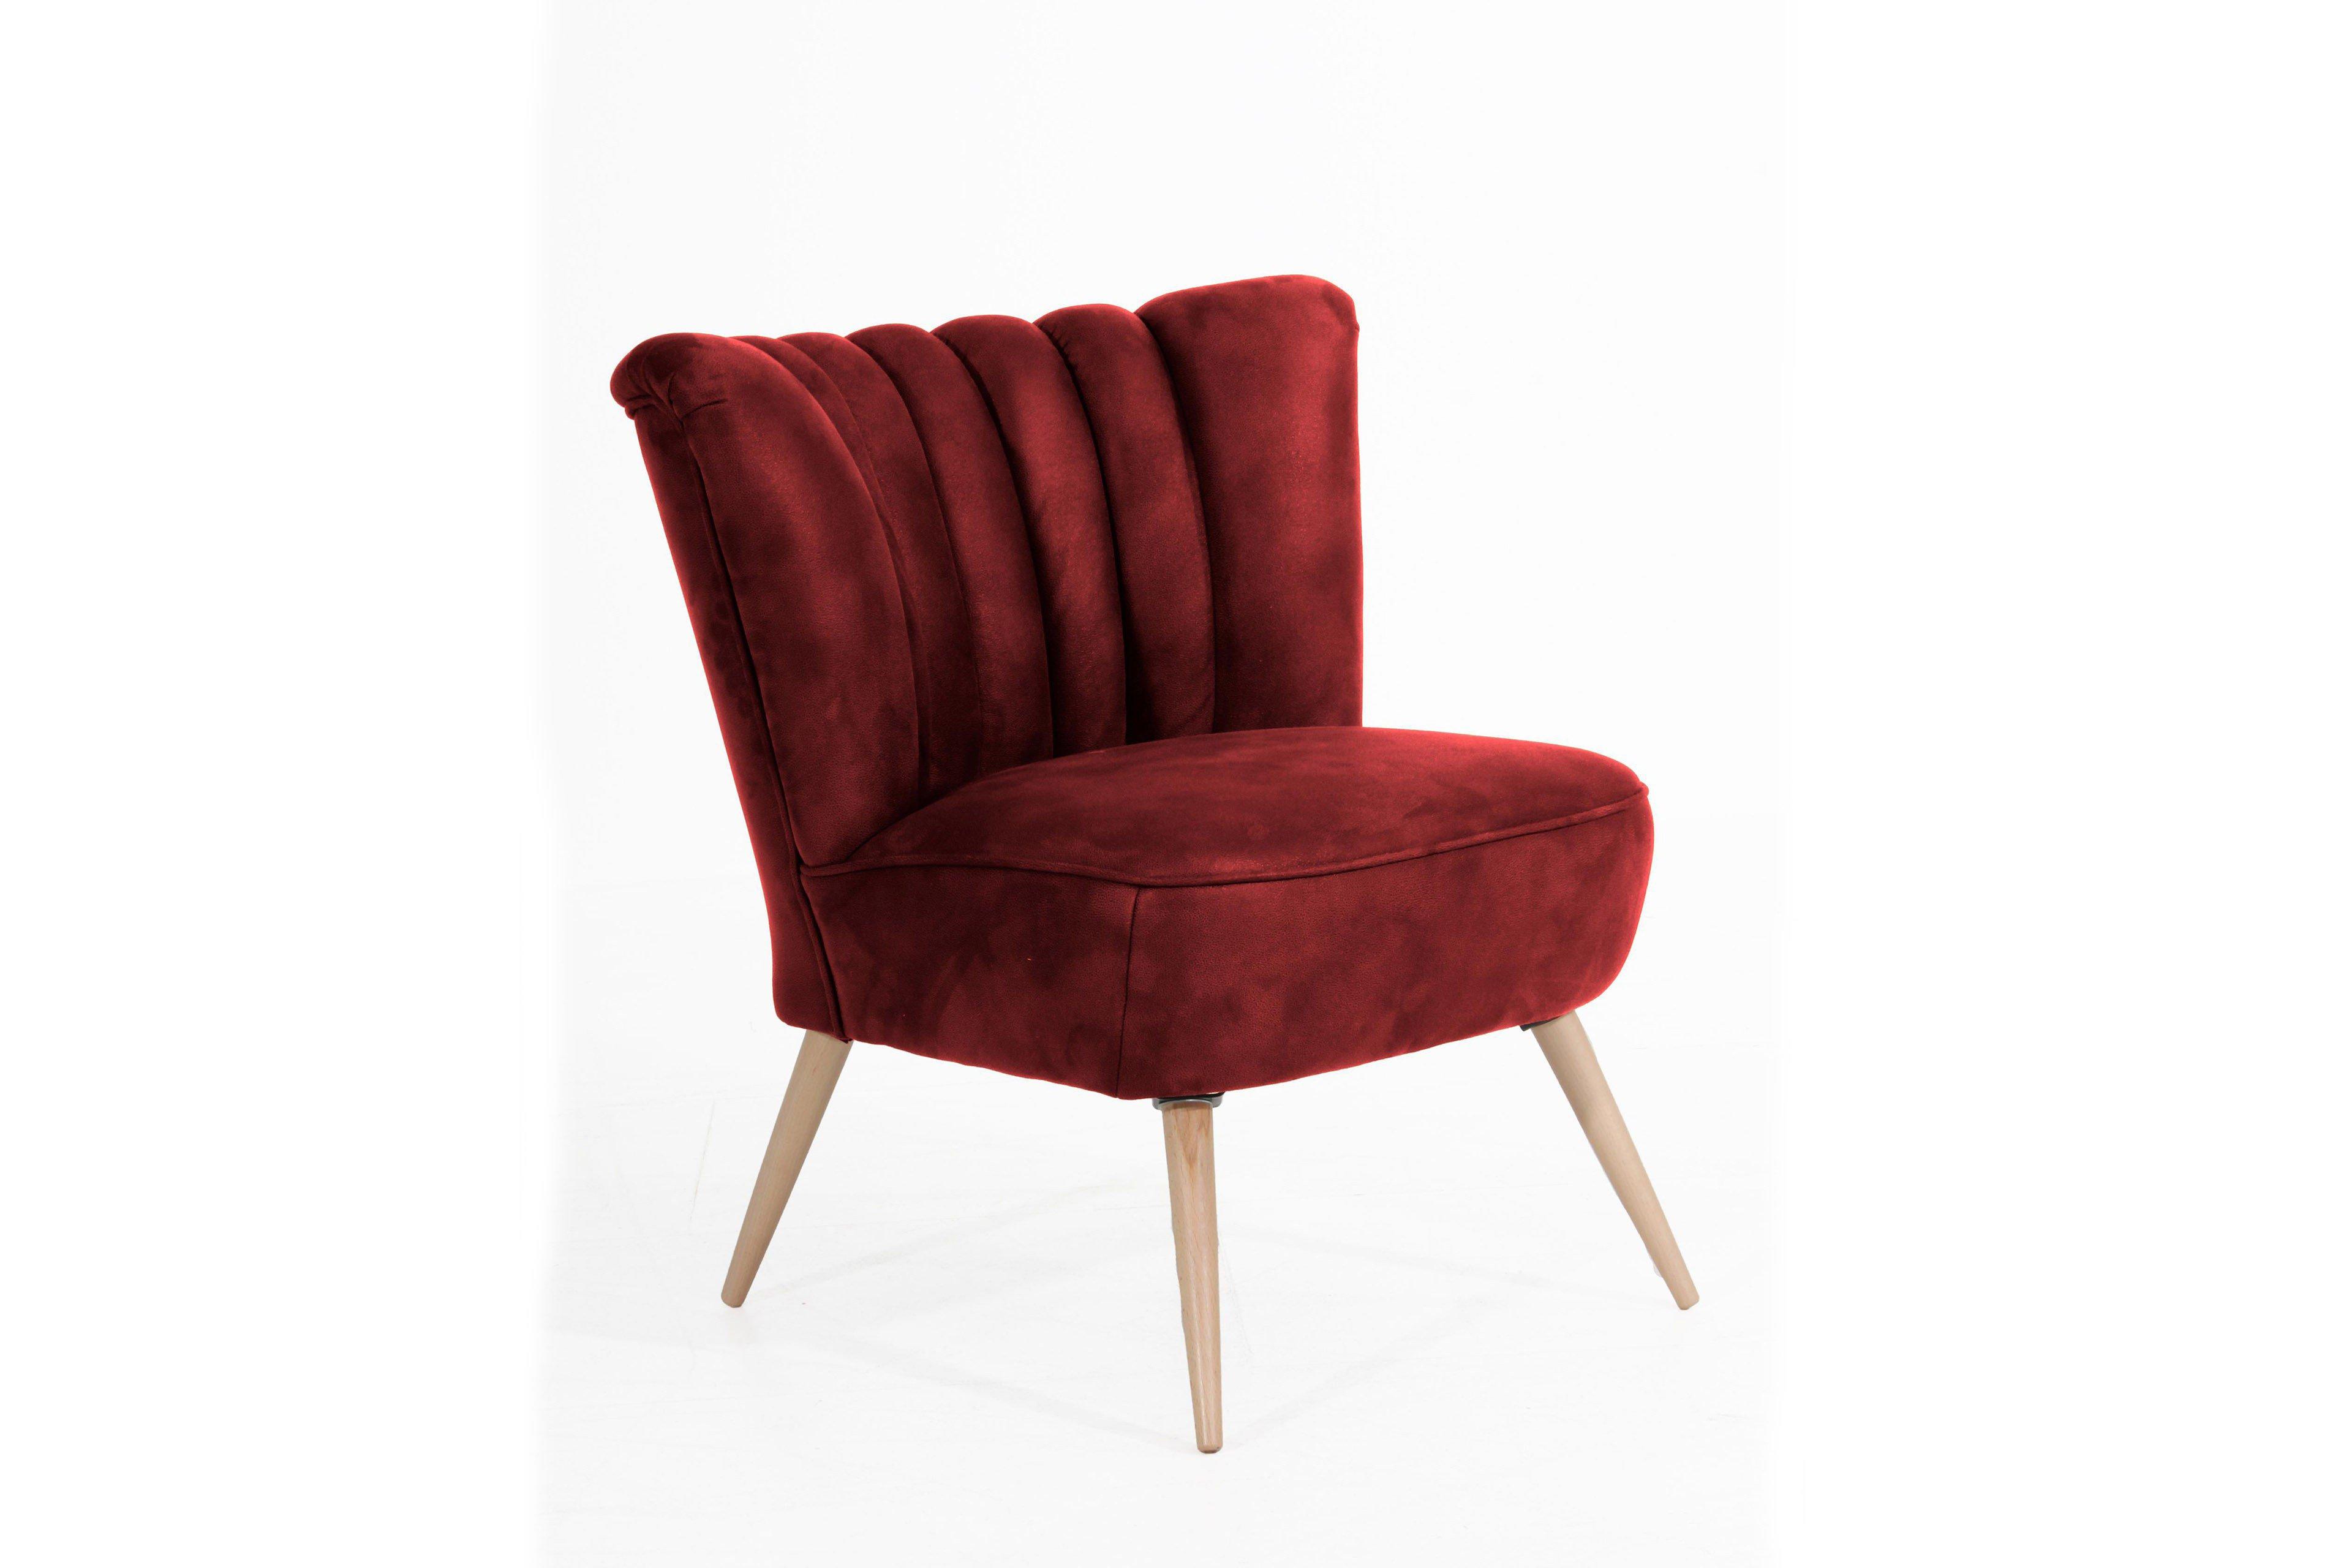 sessel rot, max winzer alessandro sessel in rot | möbel letz - ihr online-shop, Design ideen